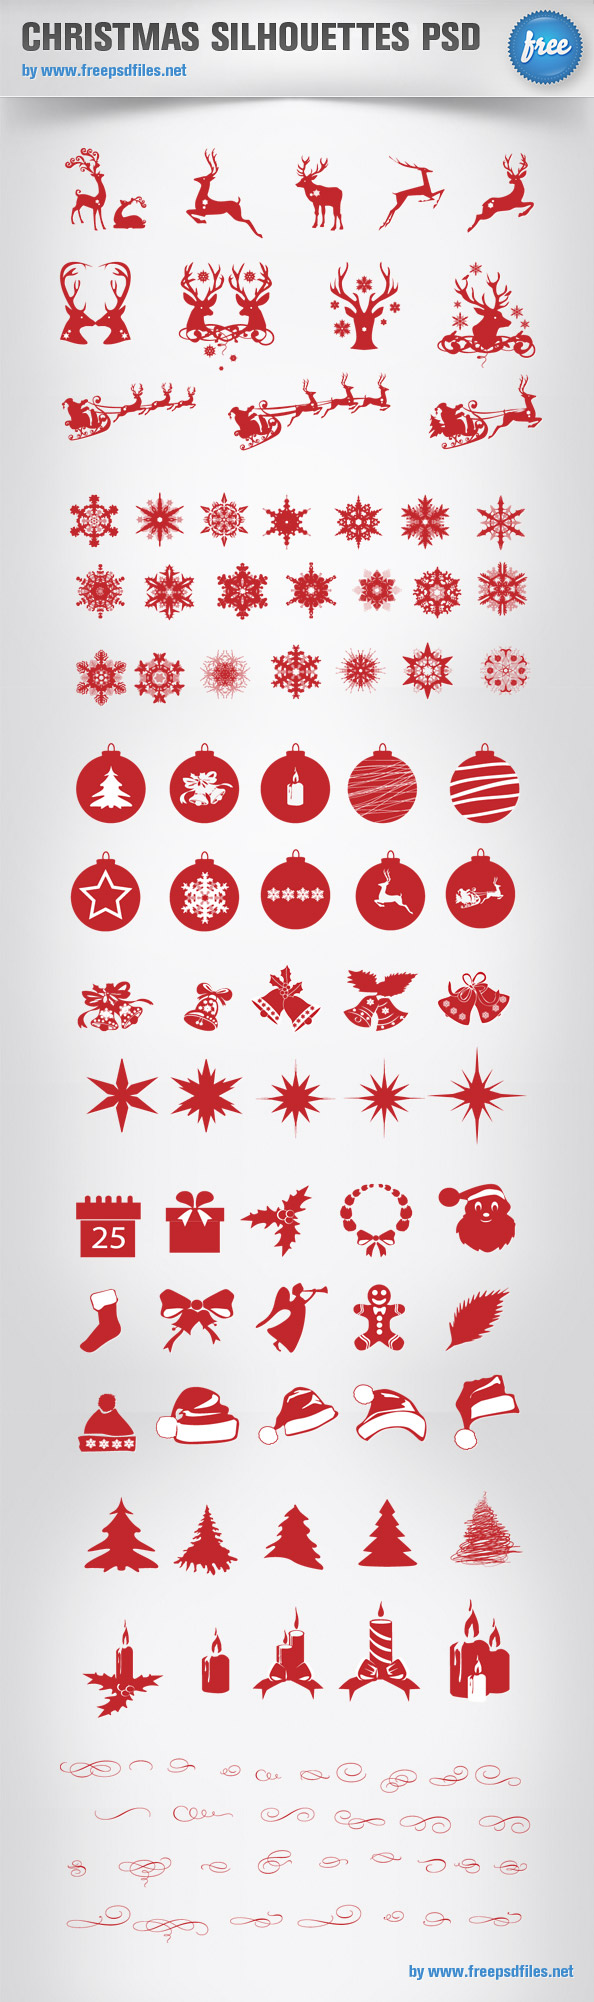 Christmas Silhouettes PSD